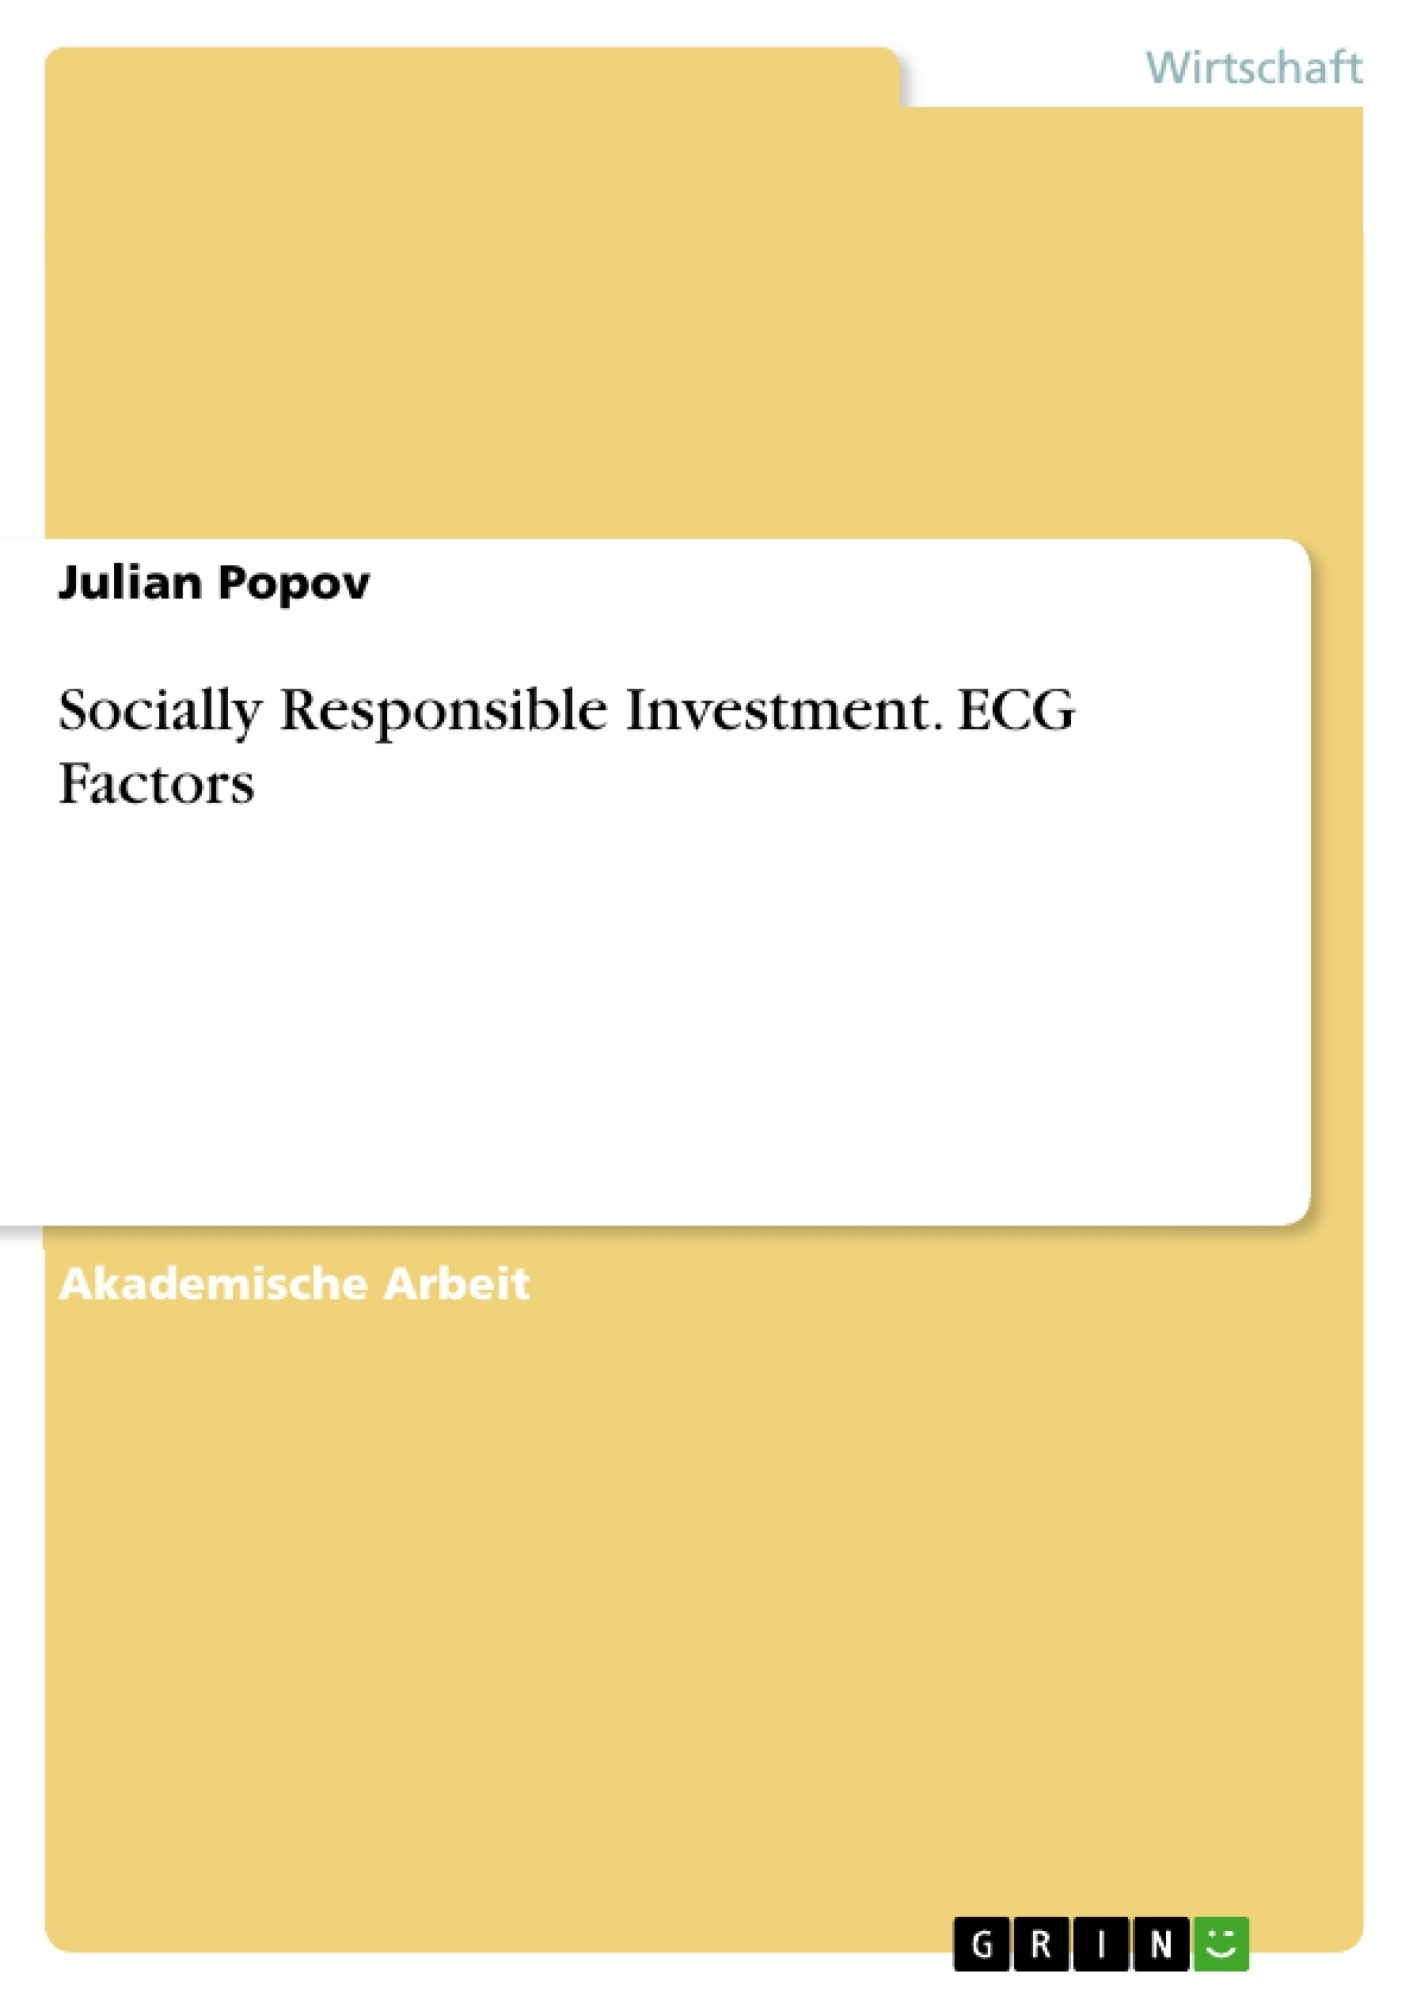 Titel: Socially Responsible Investment. ECG Factors